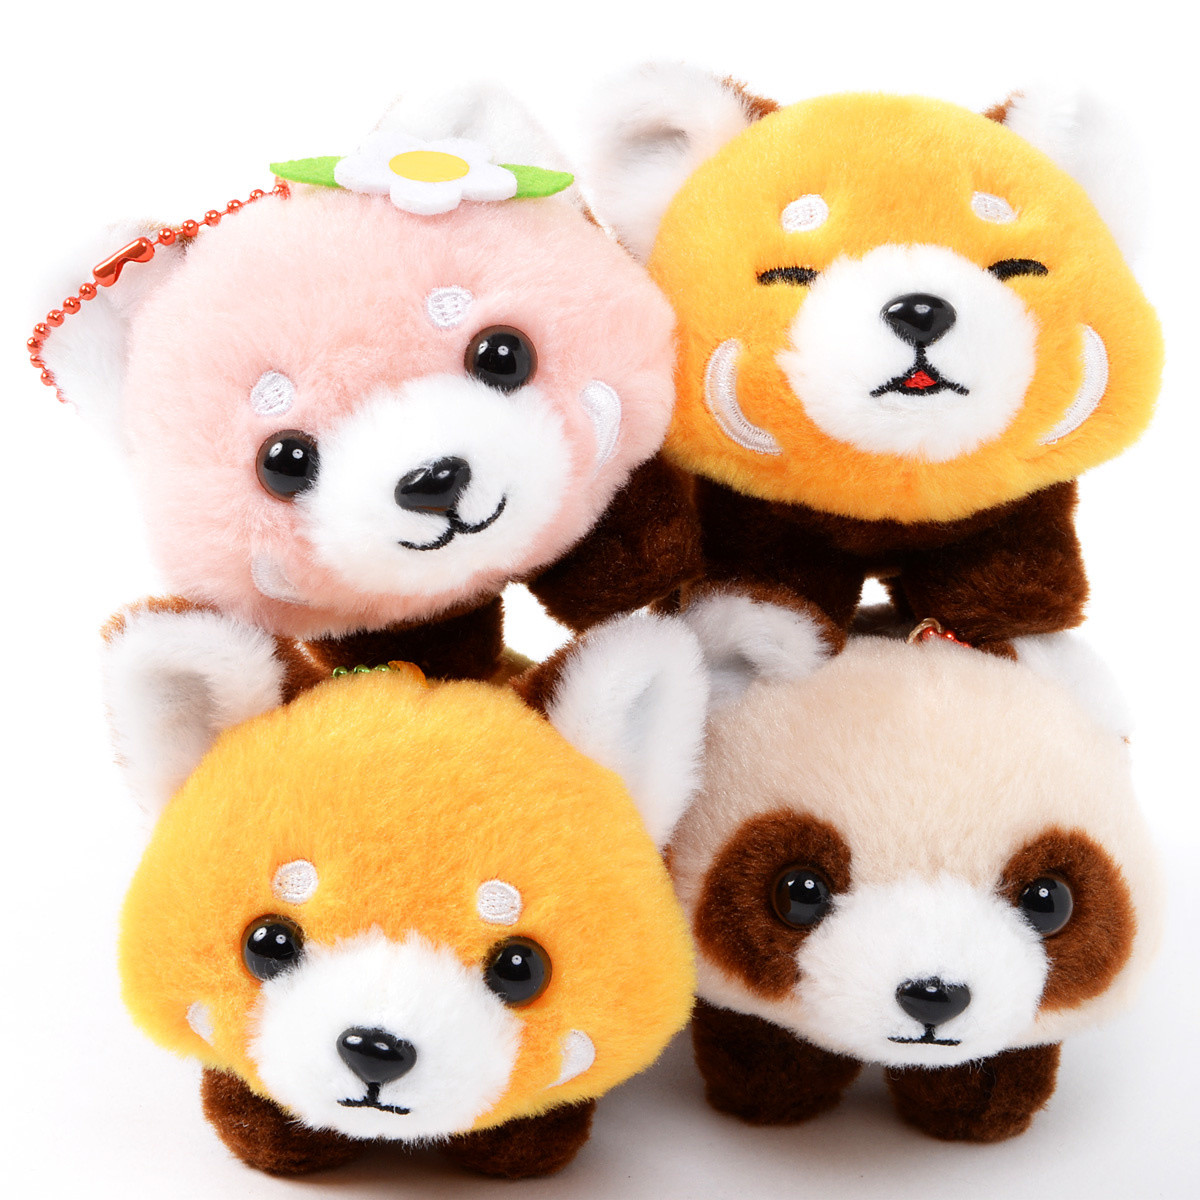 Lesser Panda Chan Yochi Yochi Red Panda Plush Collection Ball Chain